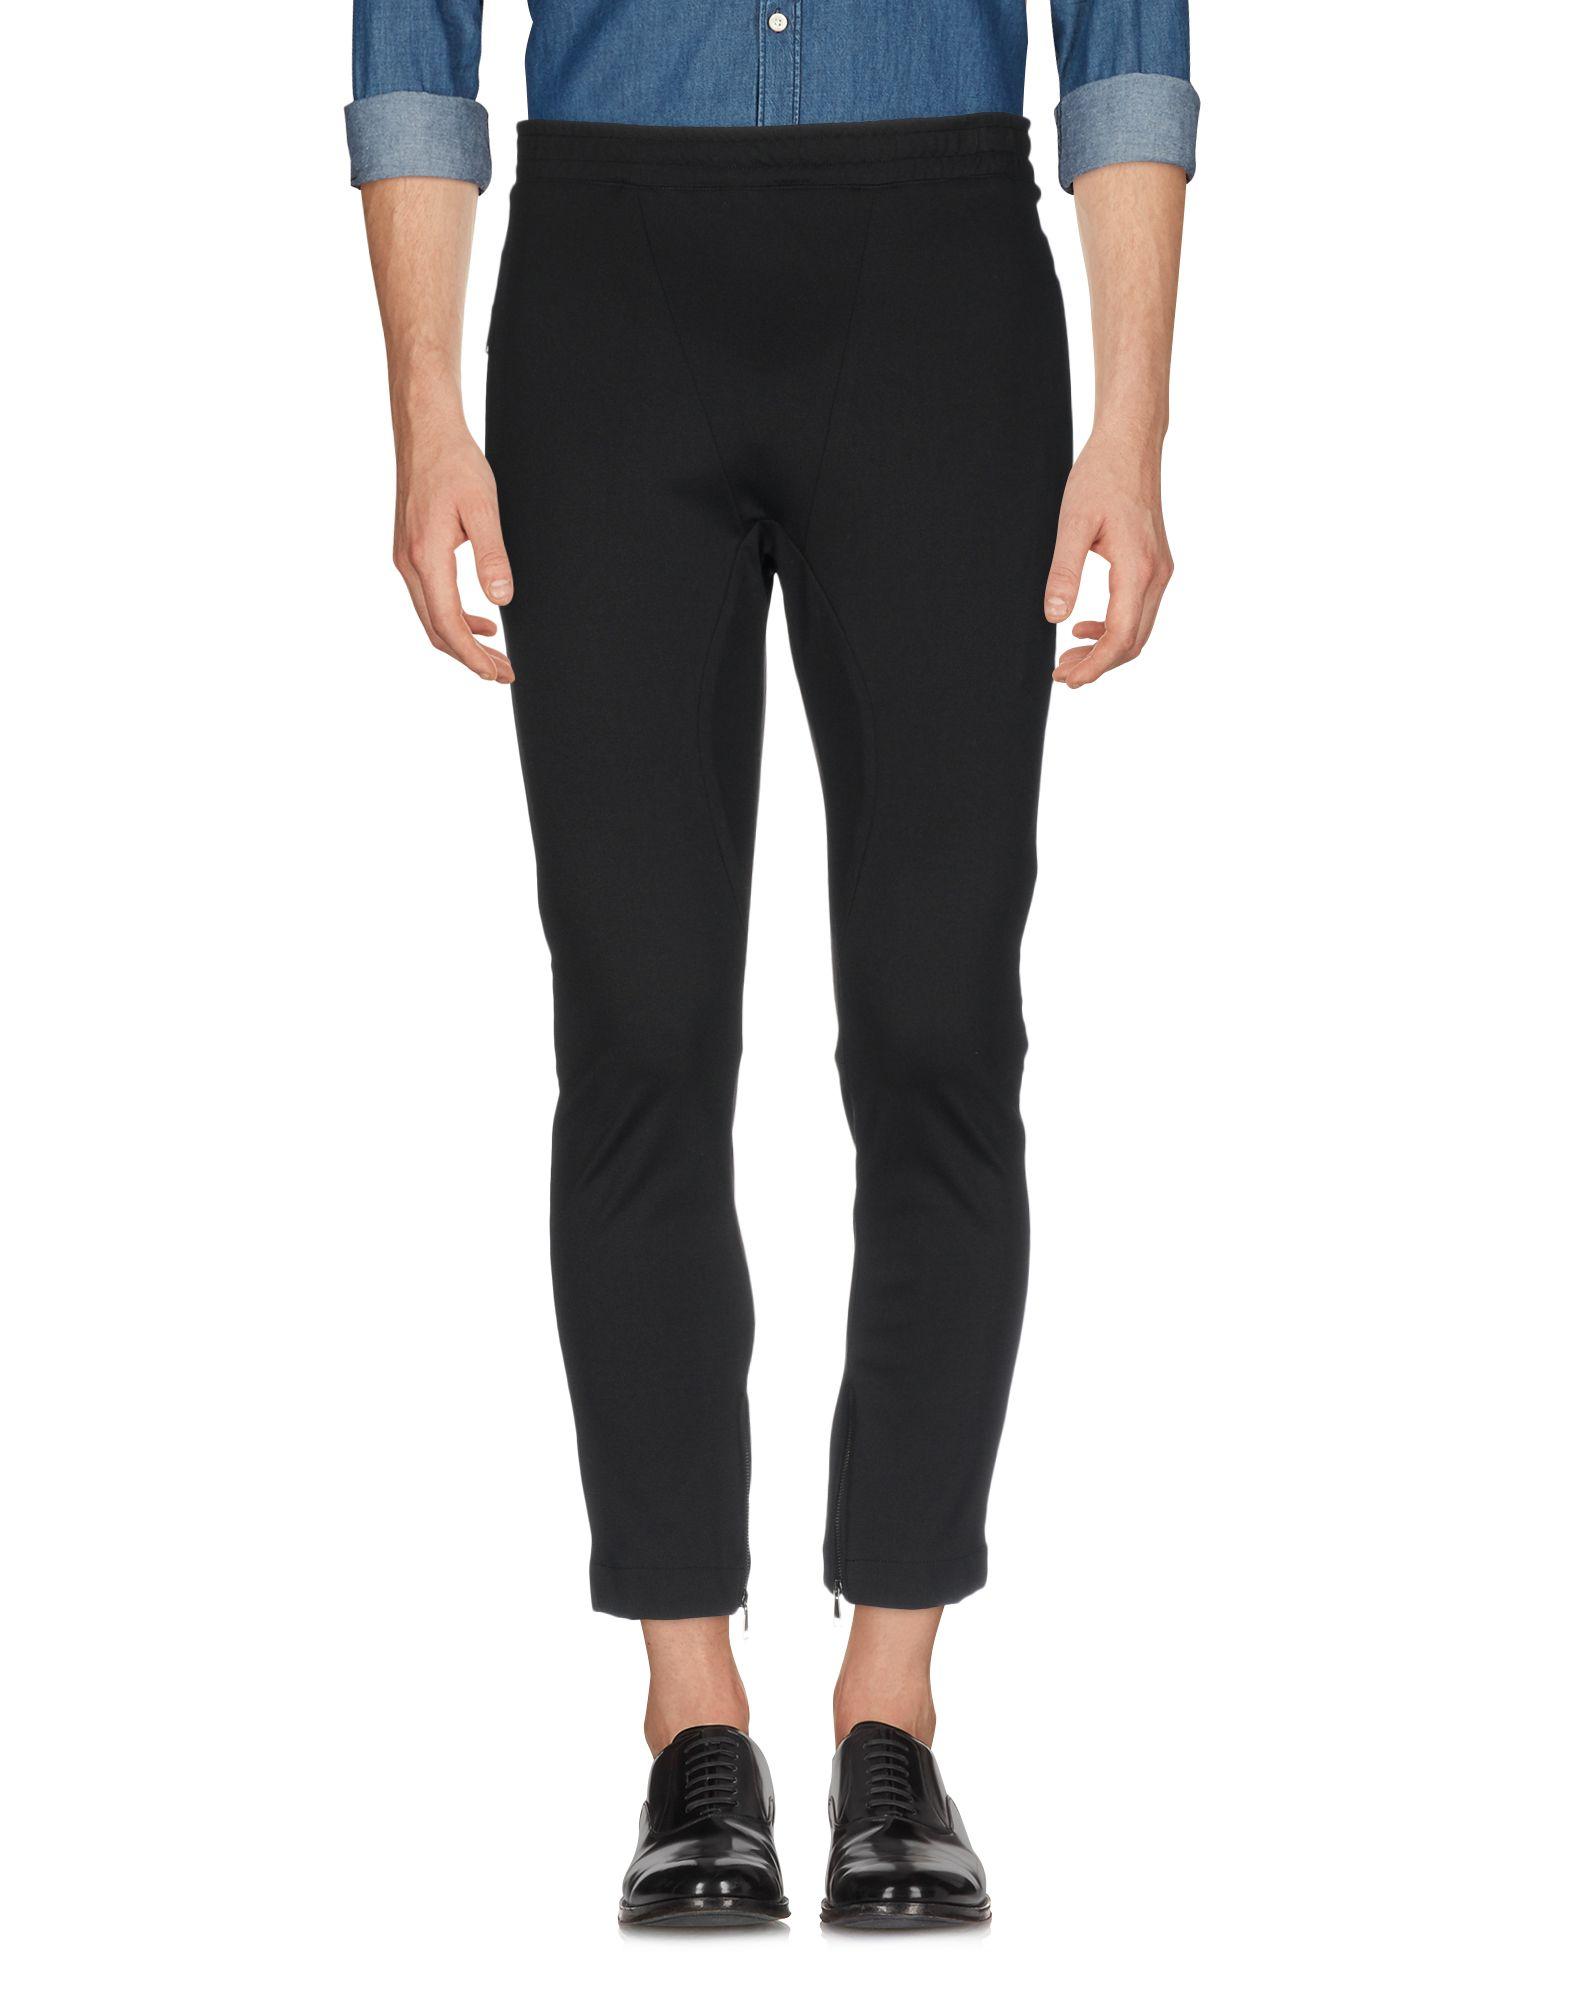 Pantalone Var/City Uomo - Acquista online su